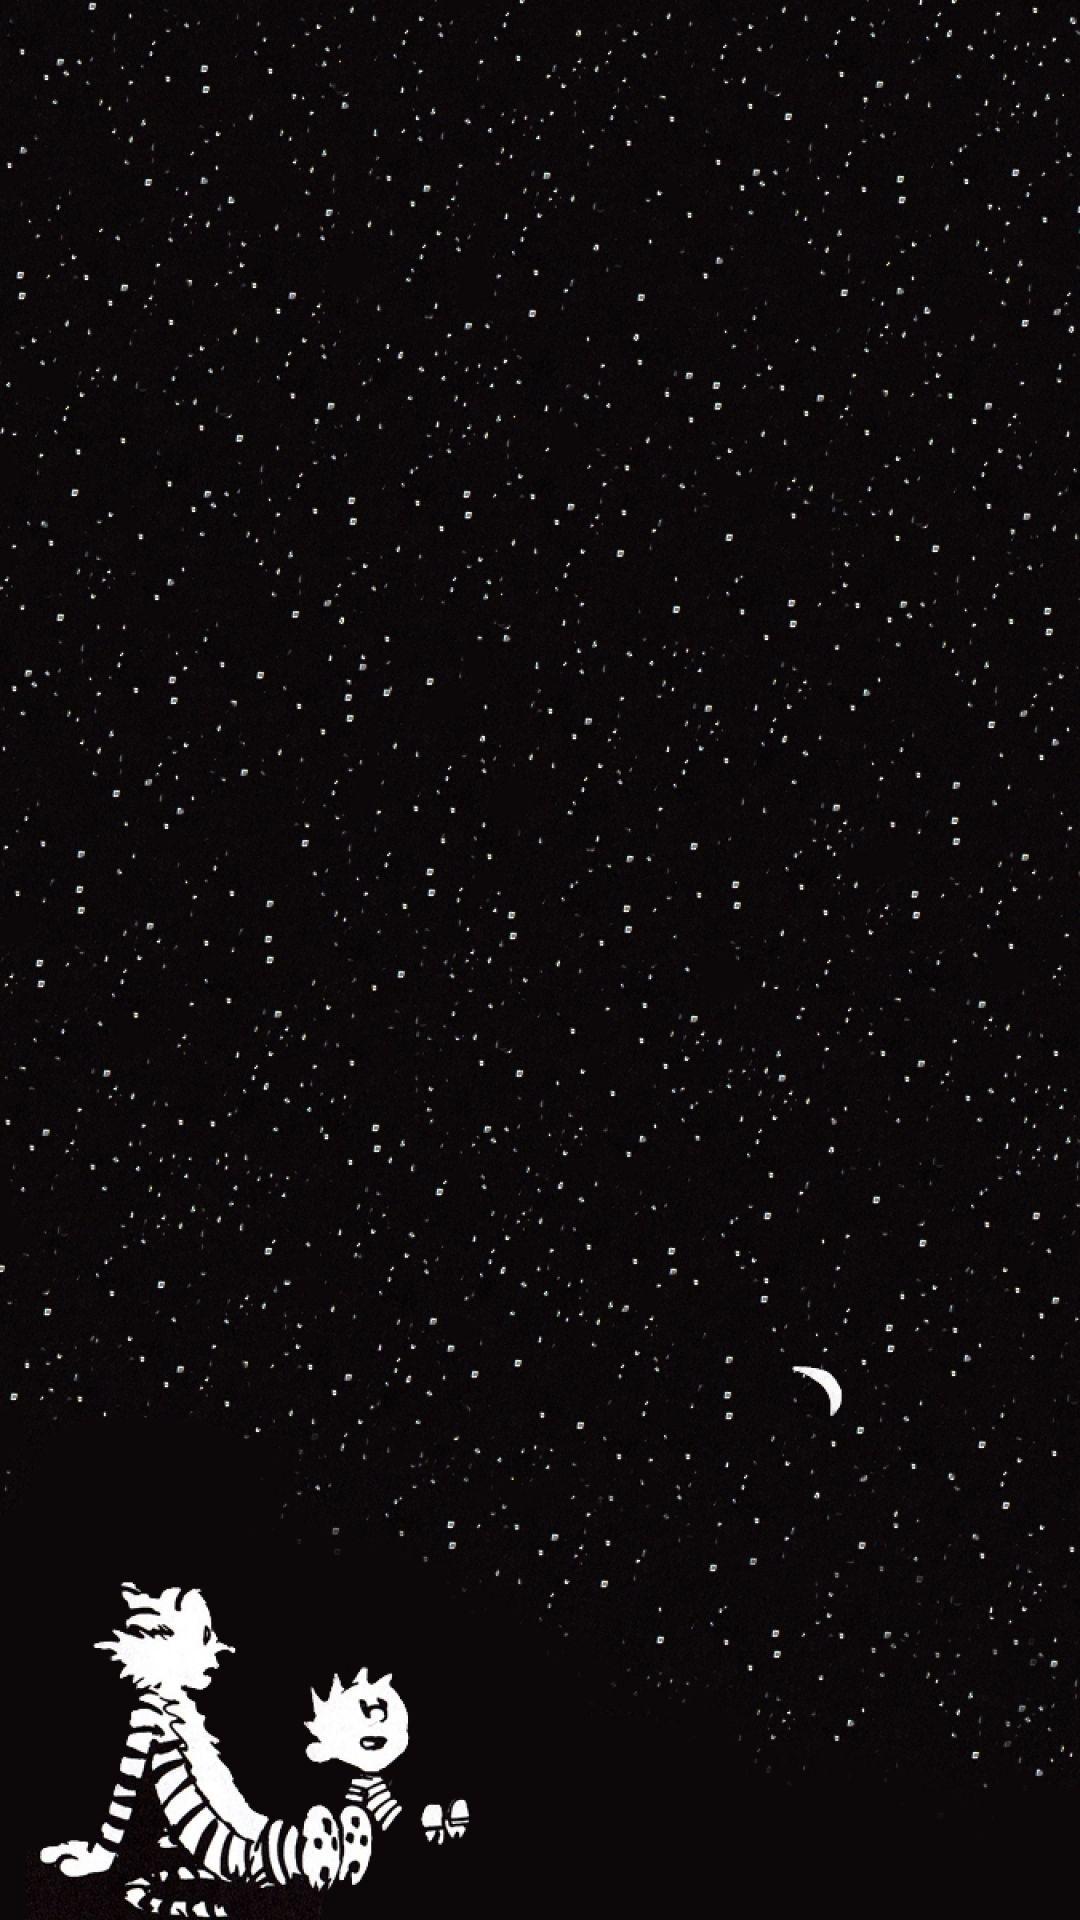 Calvin And Hobbes Stars Wallpaper Download In 2020 Starry Night Iphone Wallpaper Calvin And Hobbes Wallpaper Iphone Wallpaper Sky